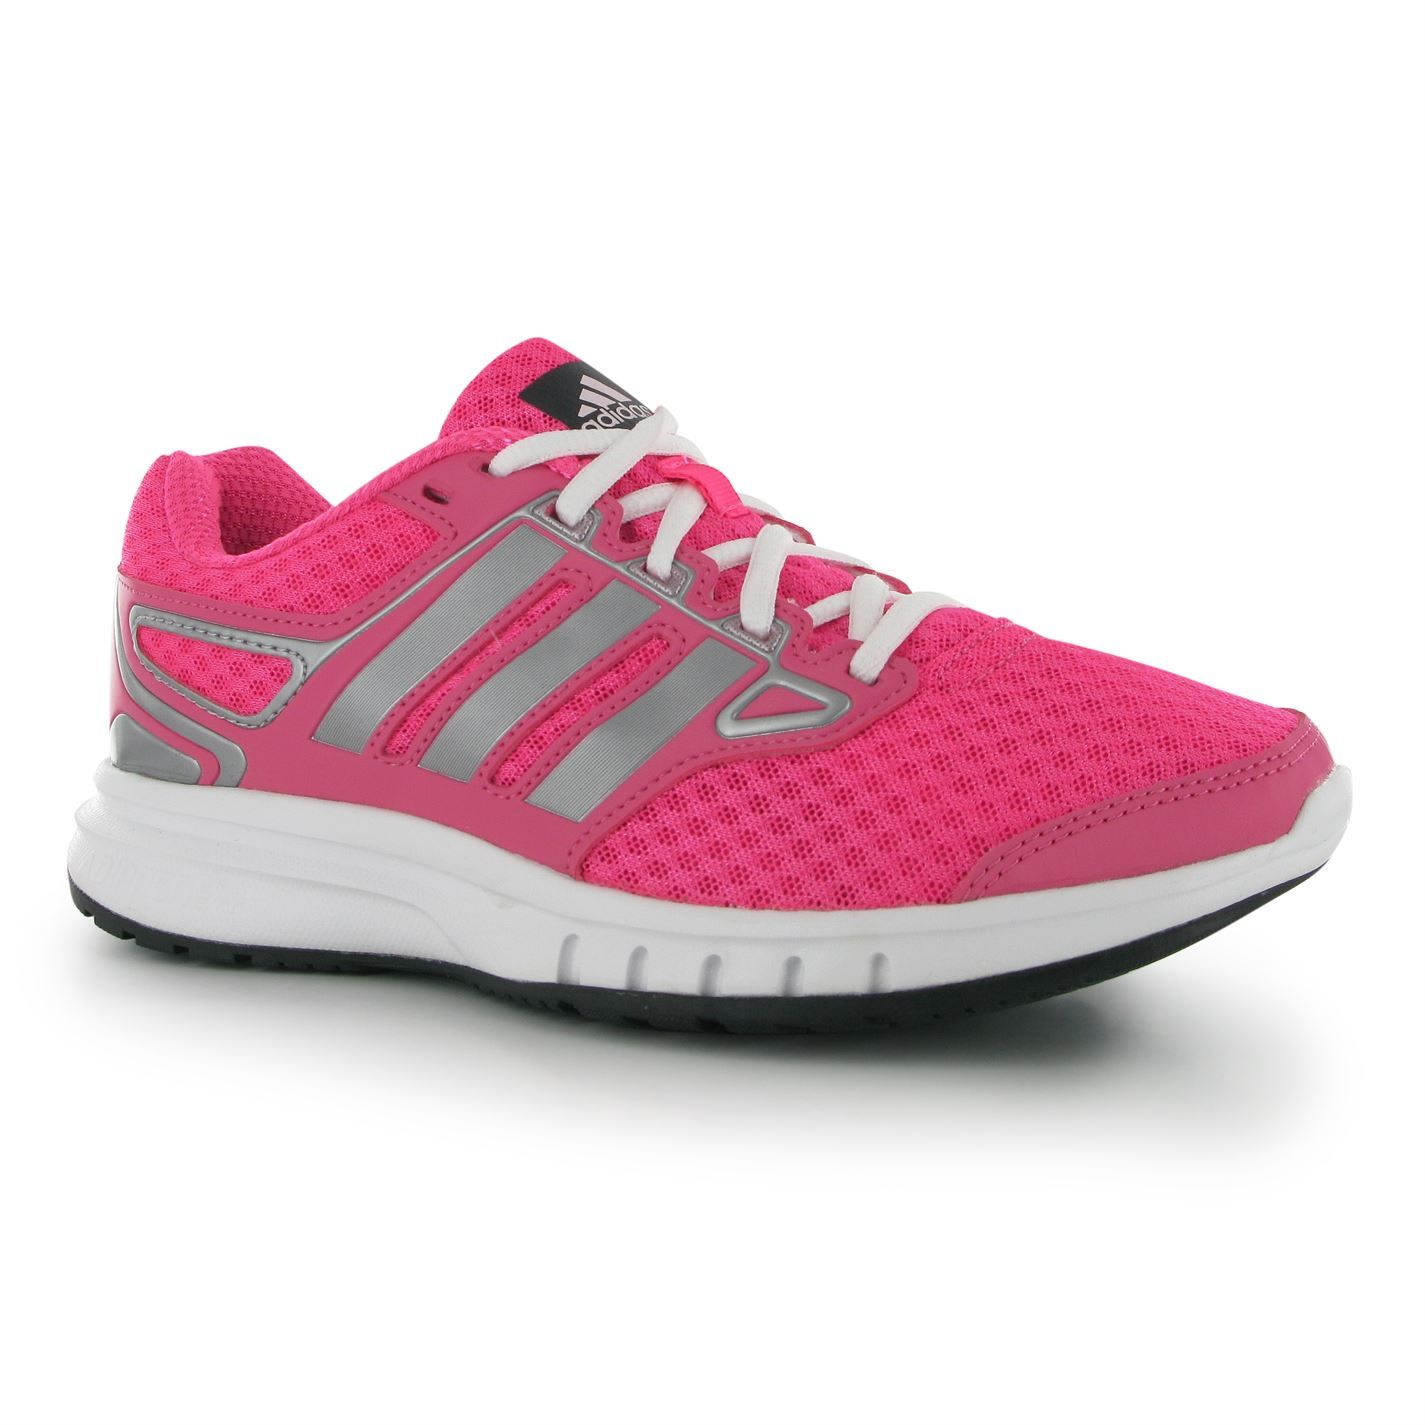 adidas Galactic Elite Ladies Running Shoes Ladies